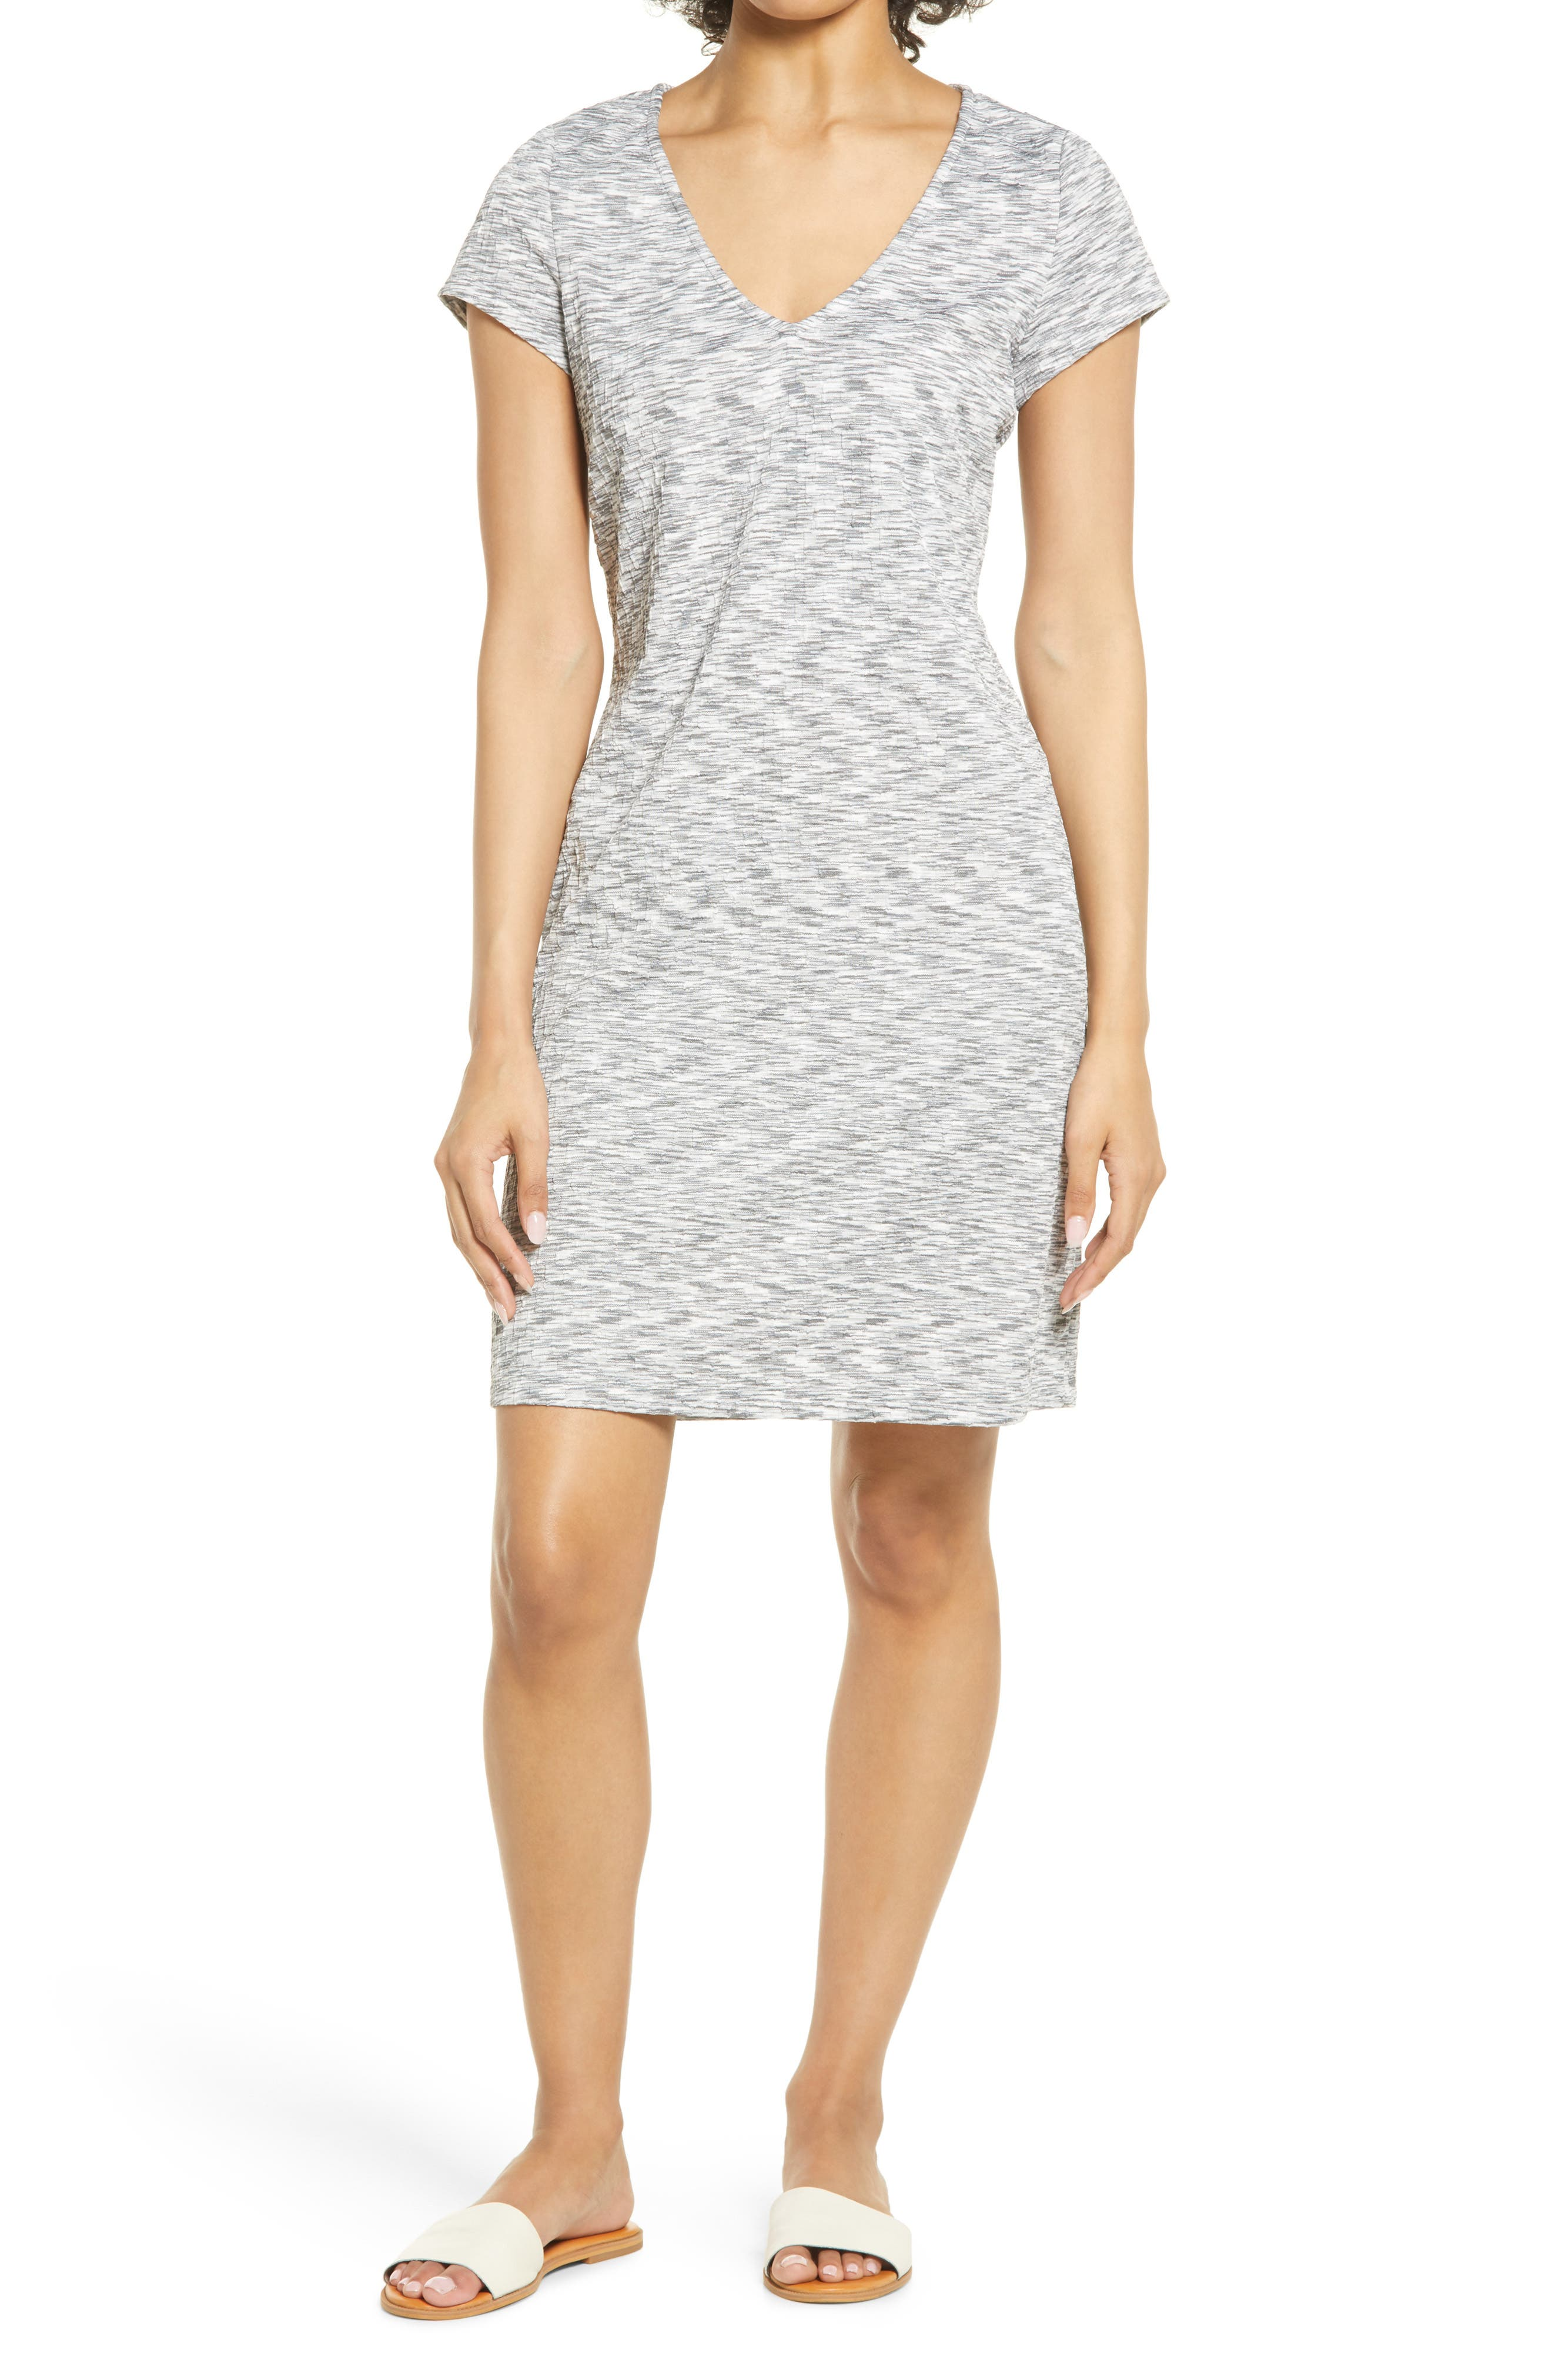 V-Neck Texture Dress